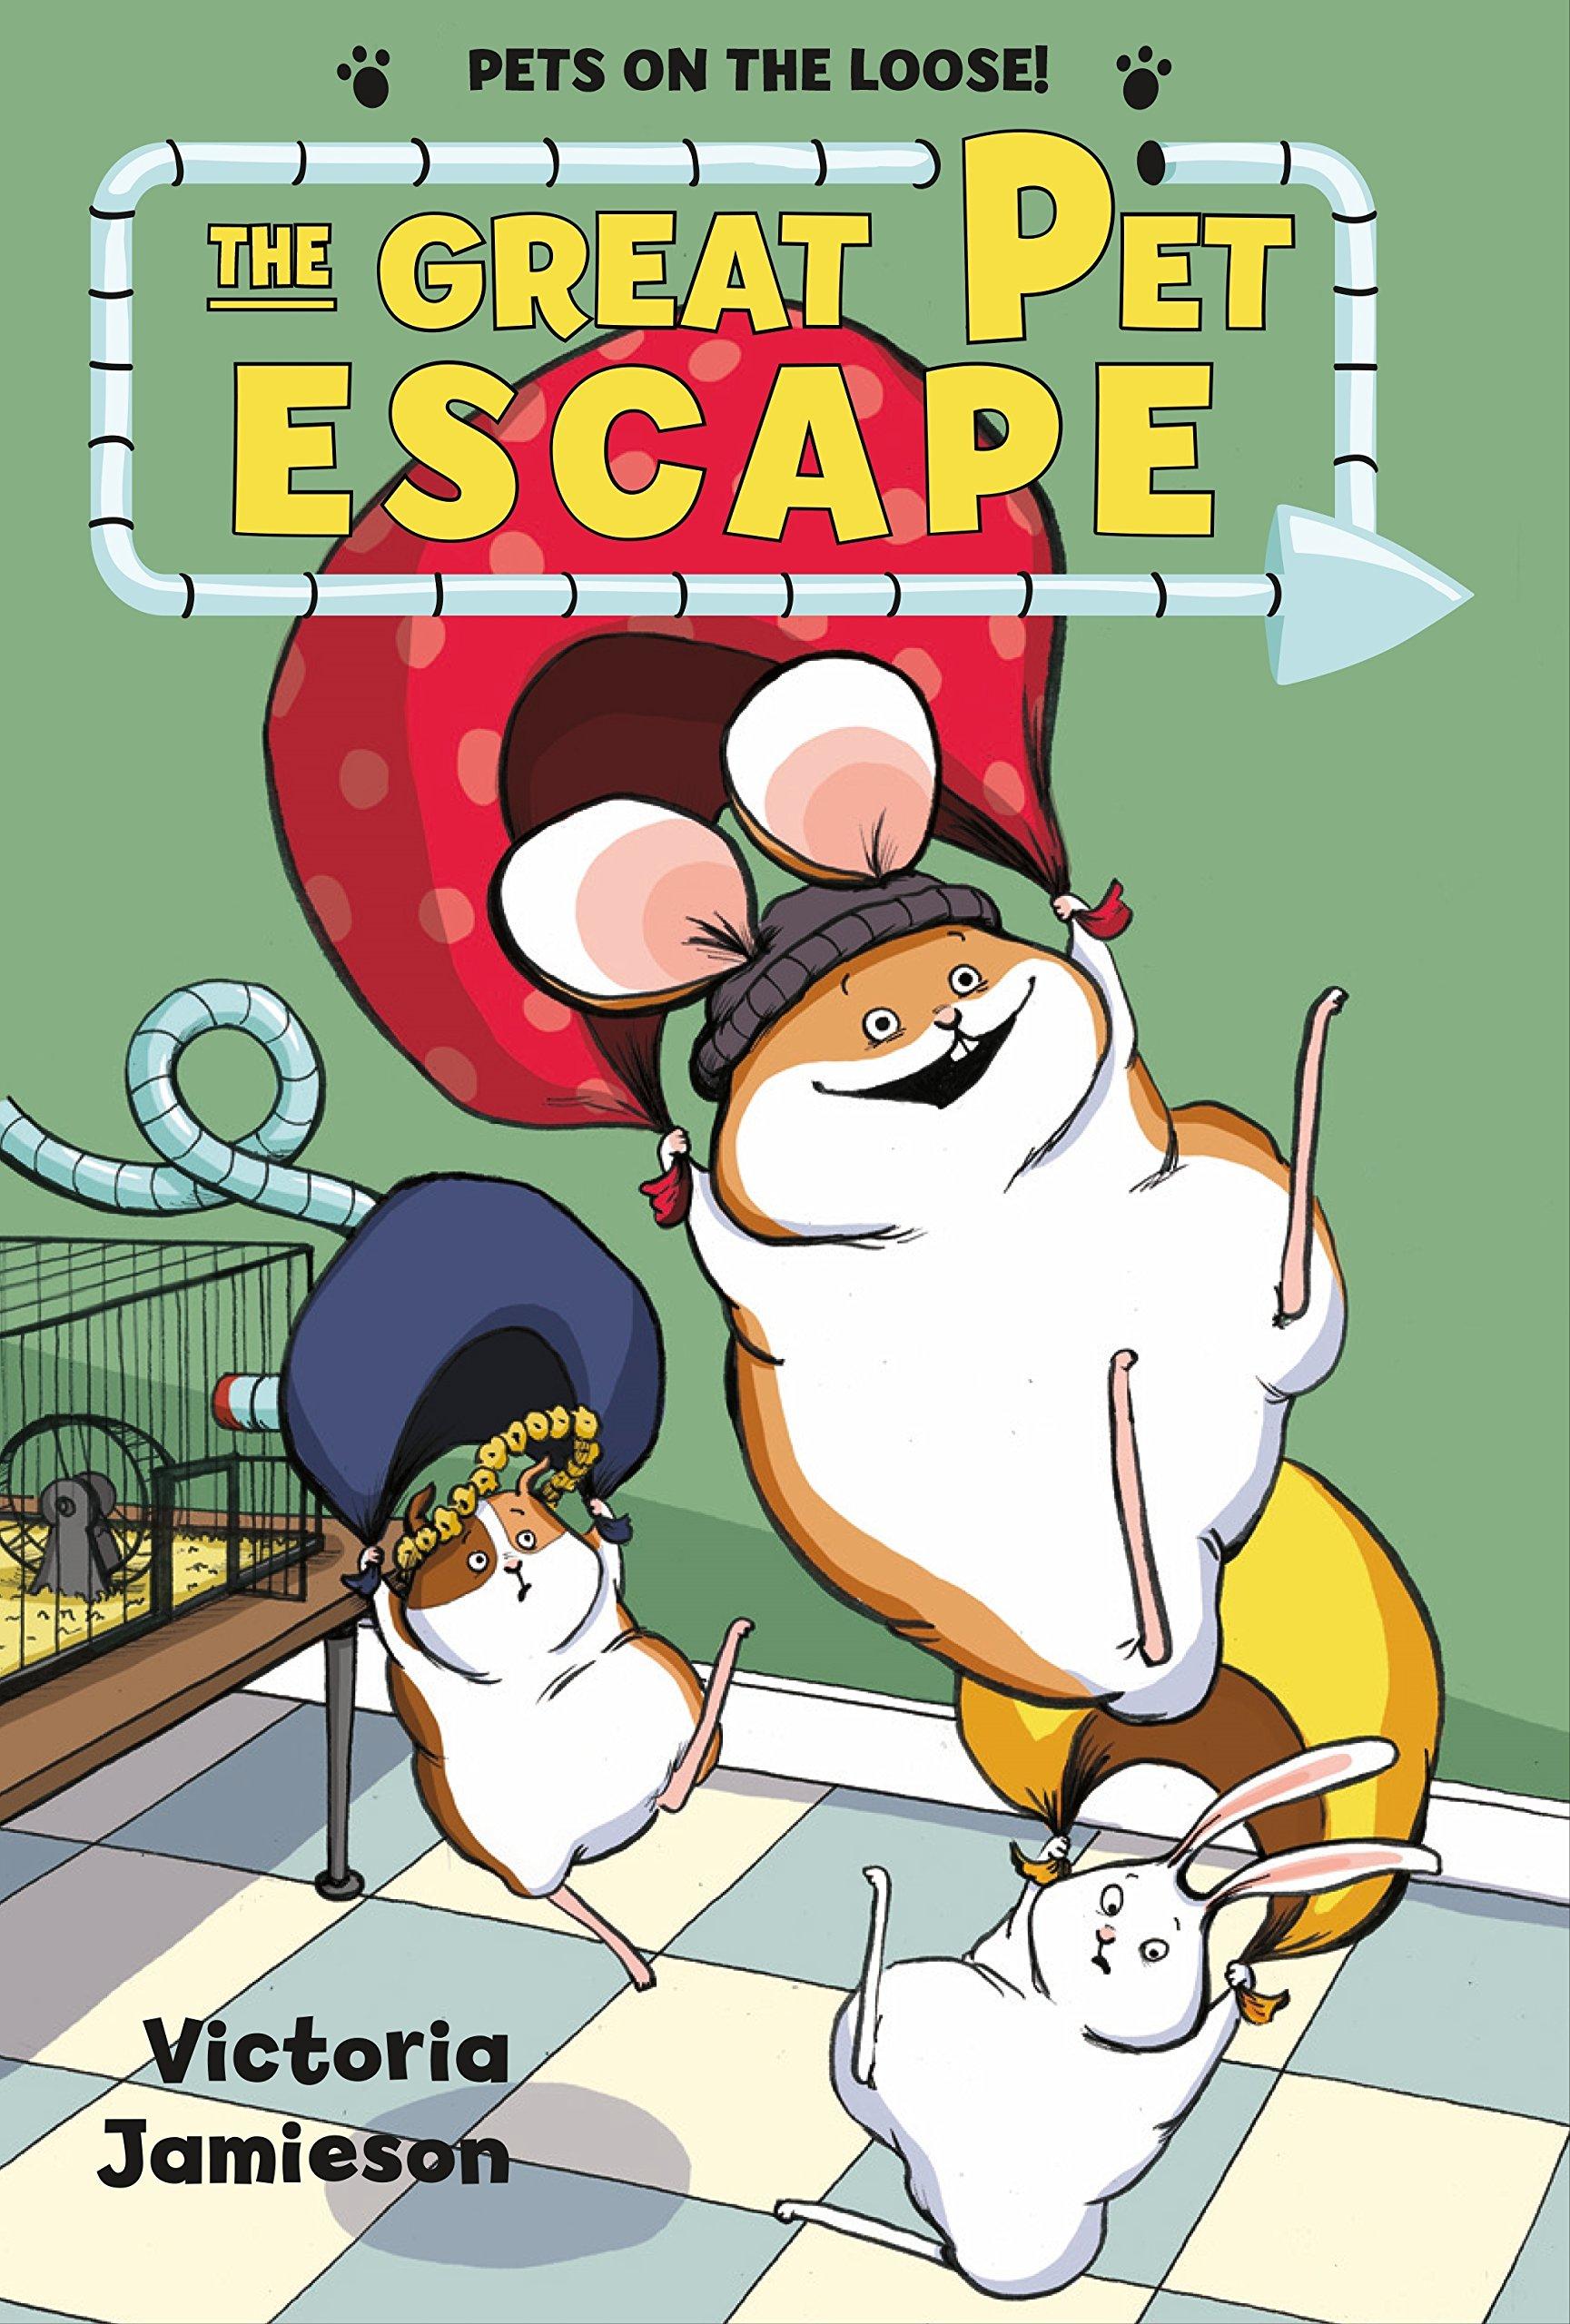 The Great Pet Escape (Pets on the Loose!): Jamieson, Victoria, Jamieson,  Victoria: 9781627791069: Amazon.com: Books